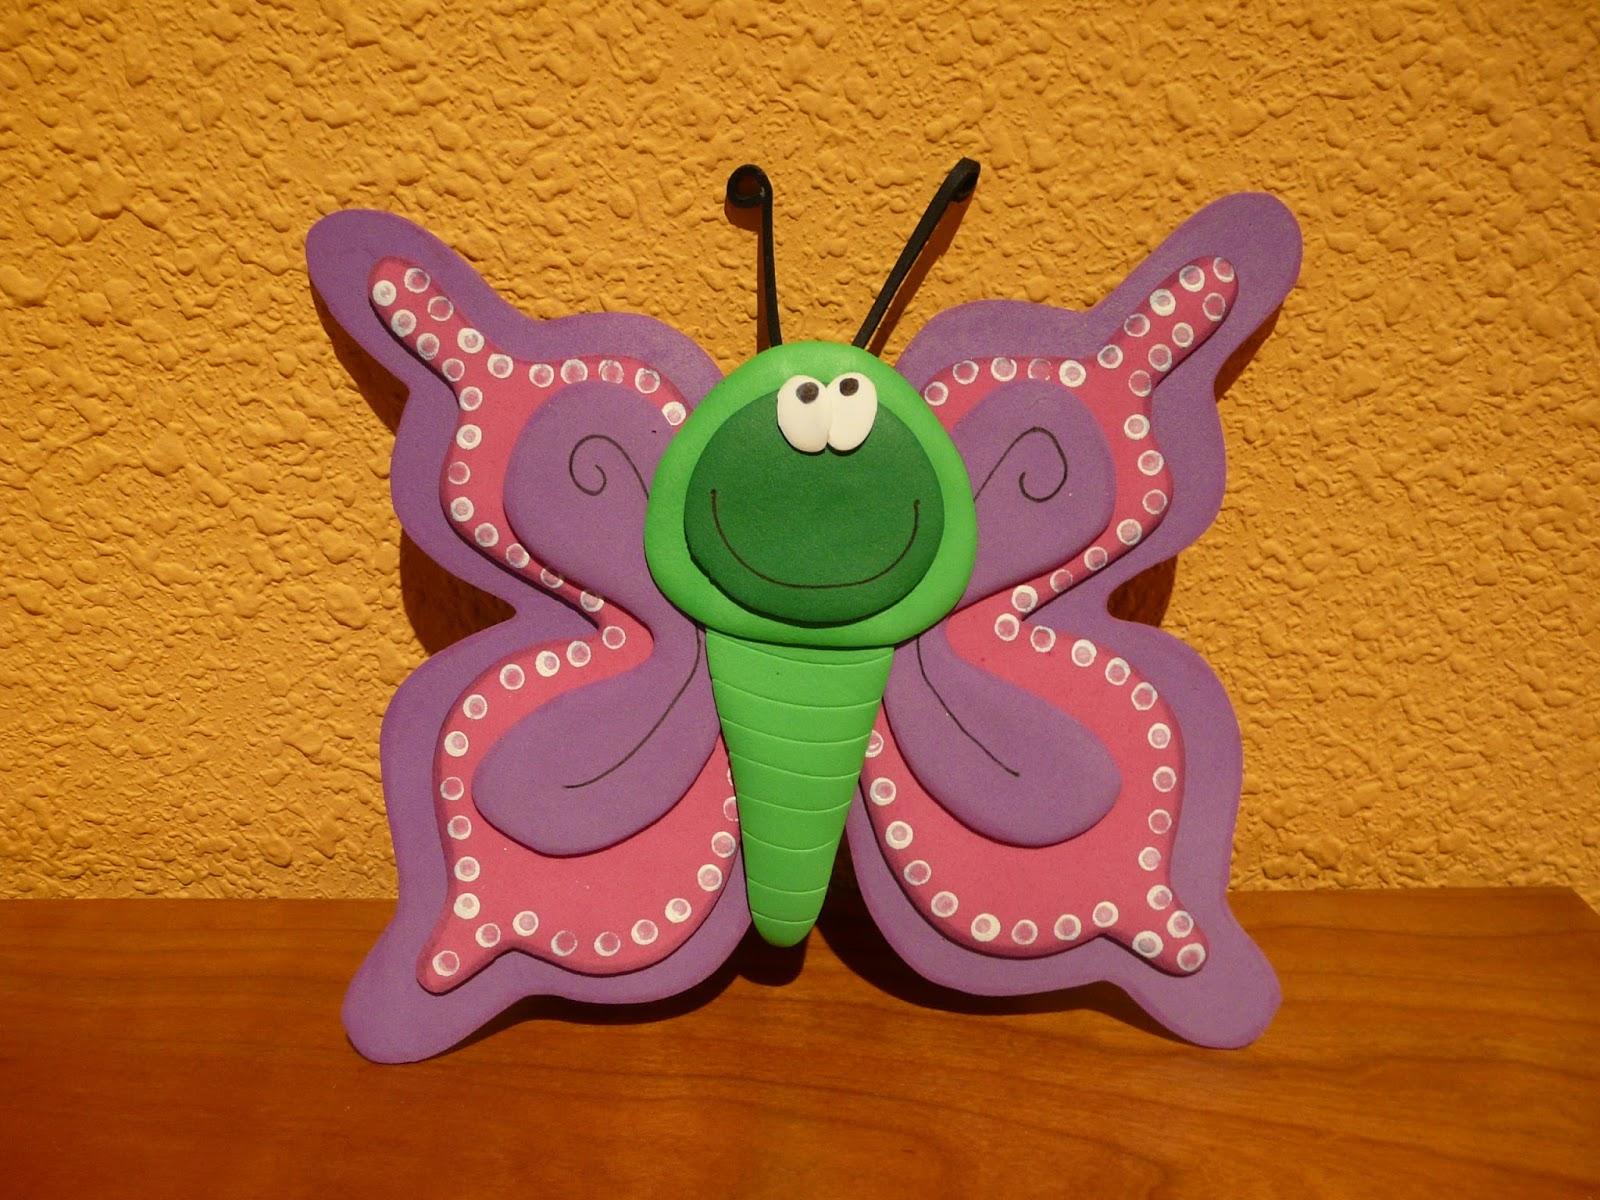 Manualidades isadial mariposa en goma eva - Mariposas goma eva ...